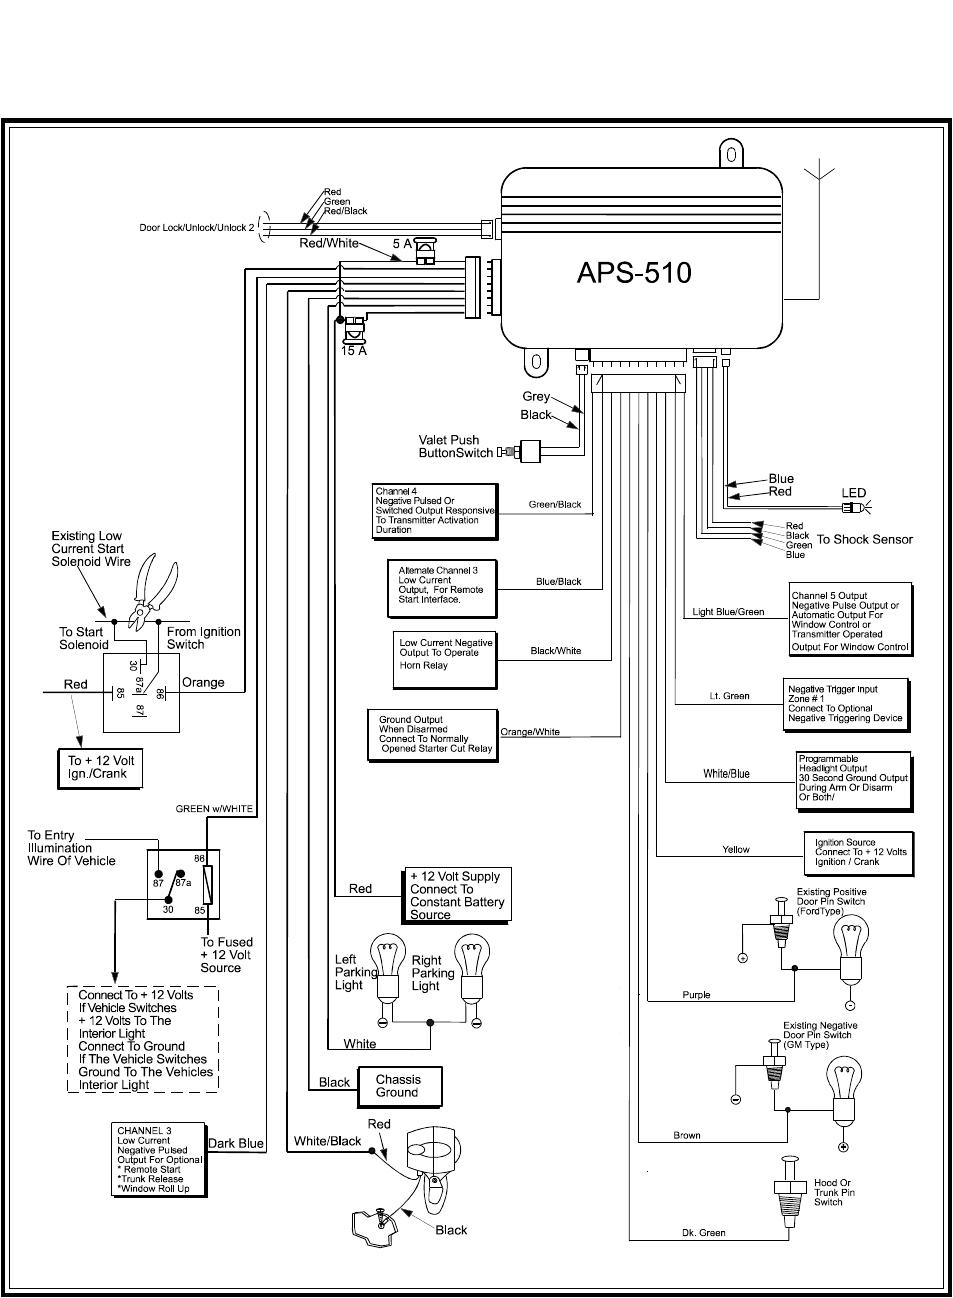 bulldog wiring diagrams wiring library bulldog security alarm wiring diagram collection car security alarm wiring diagram